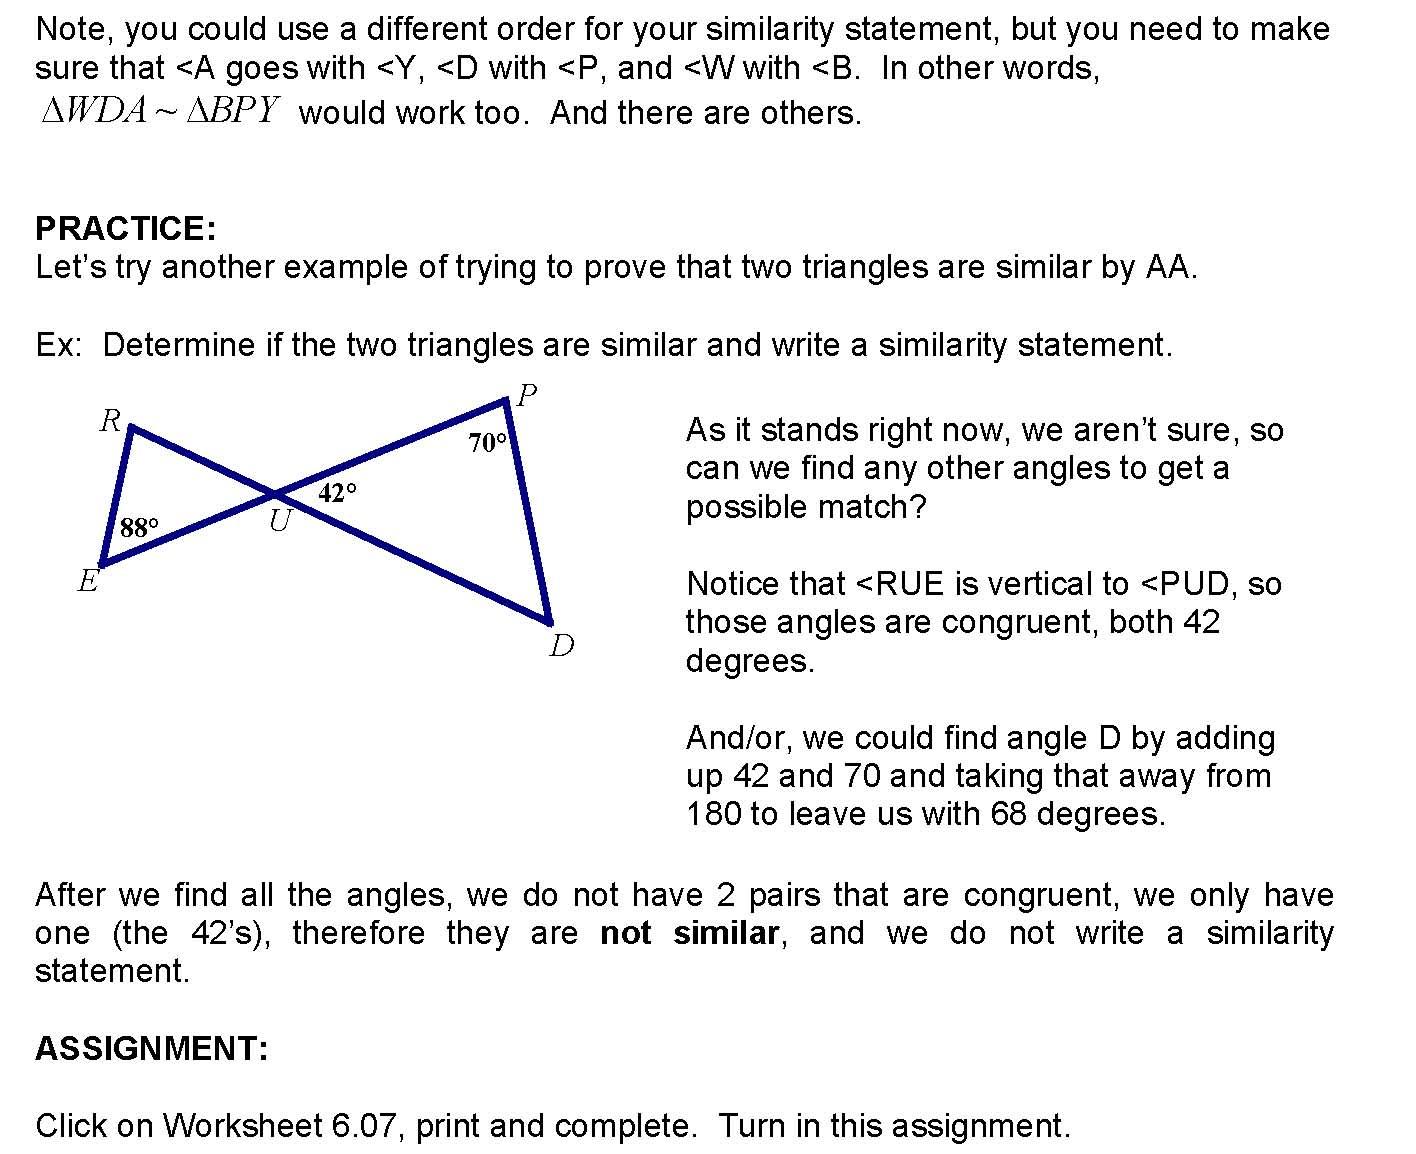 worksheet Triangle Similarity Theorems Worksheet congruent triangles and similar worksheet free worksheets c gruent nd simil r tri ngles w ksheet ksheets libr ry